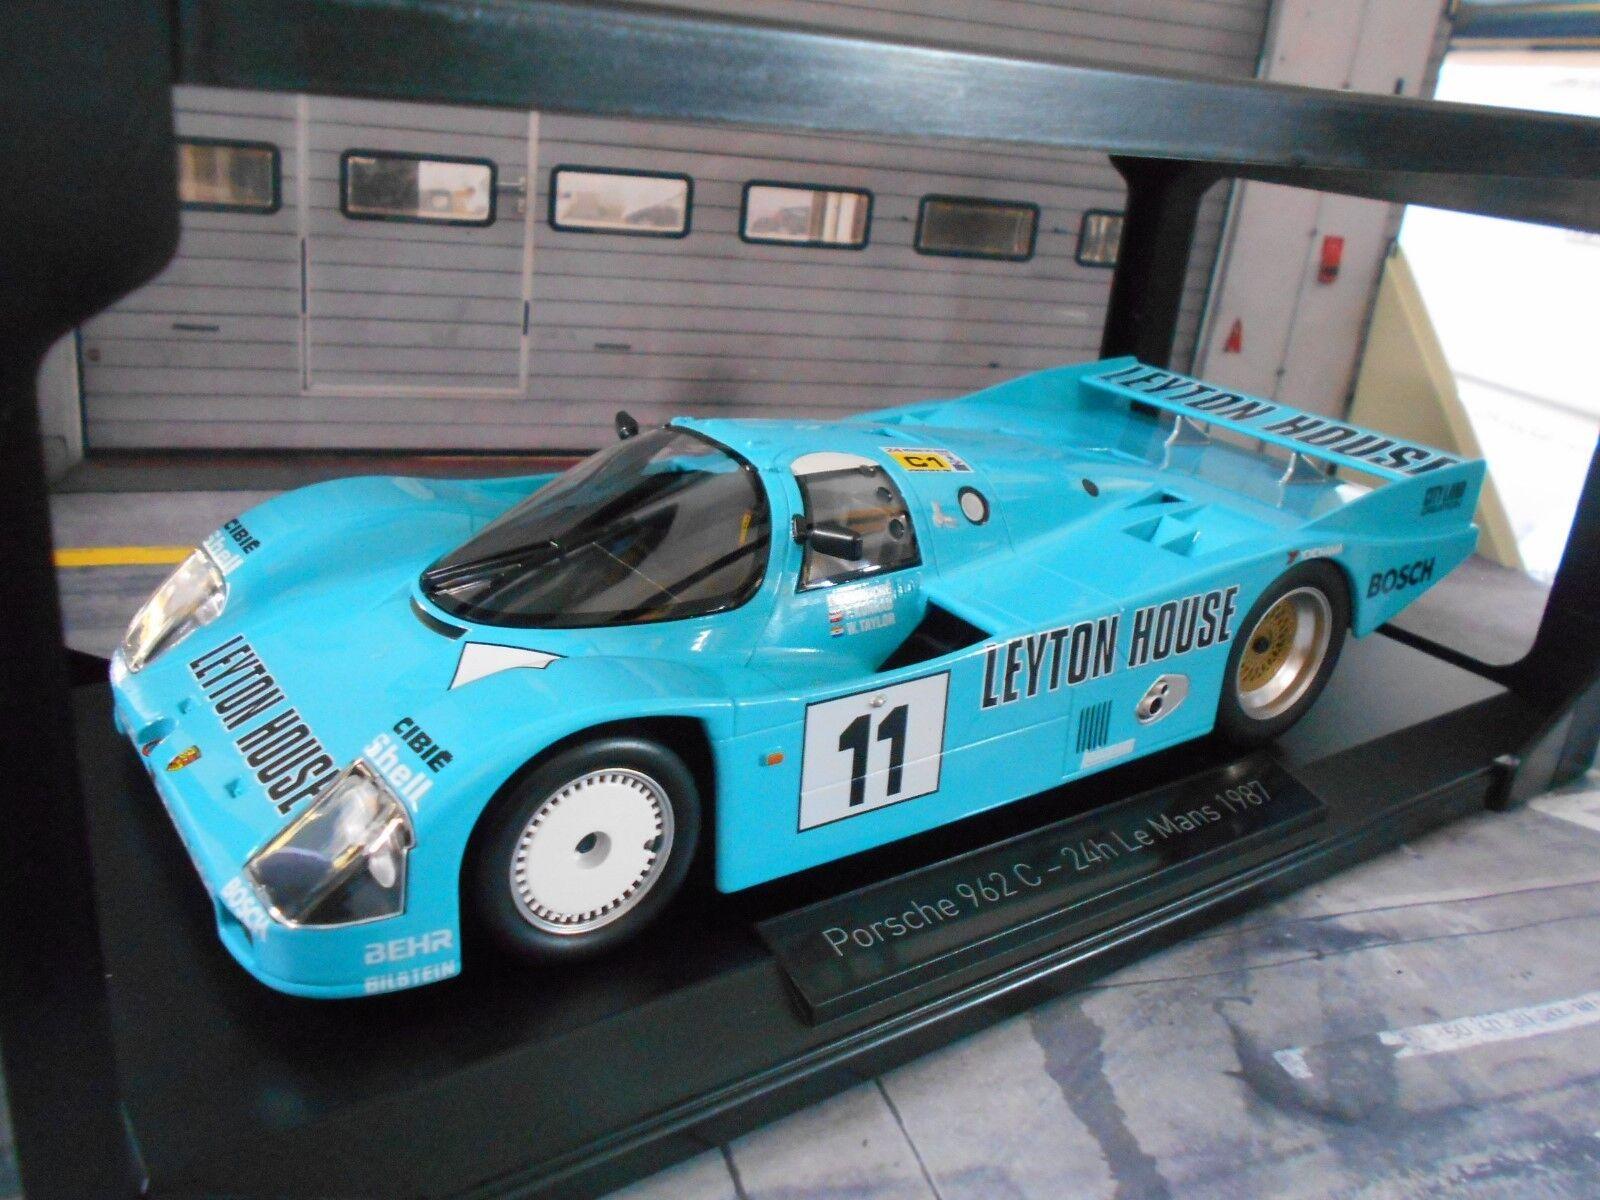 Porsche 962 C 956 II Le Mans 1987  11 Leyton House Konrad FOUCHE Lim NOREV 1 18